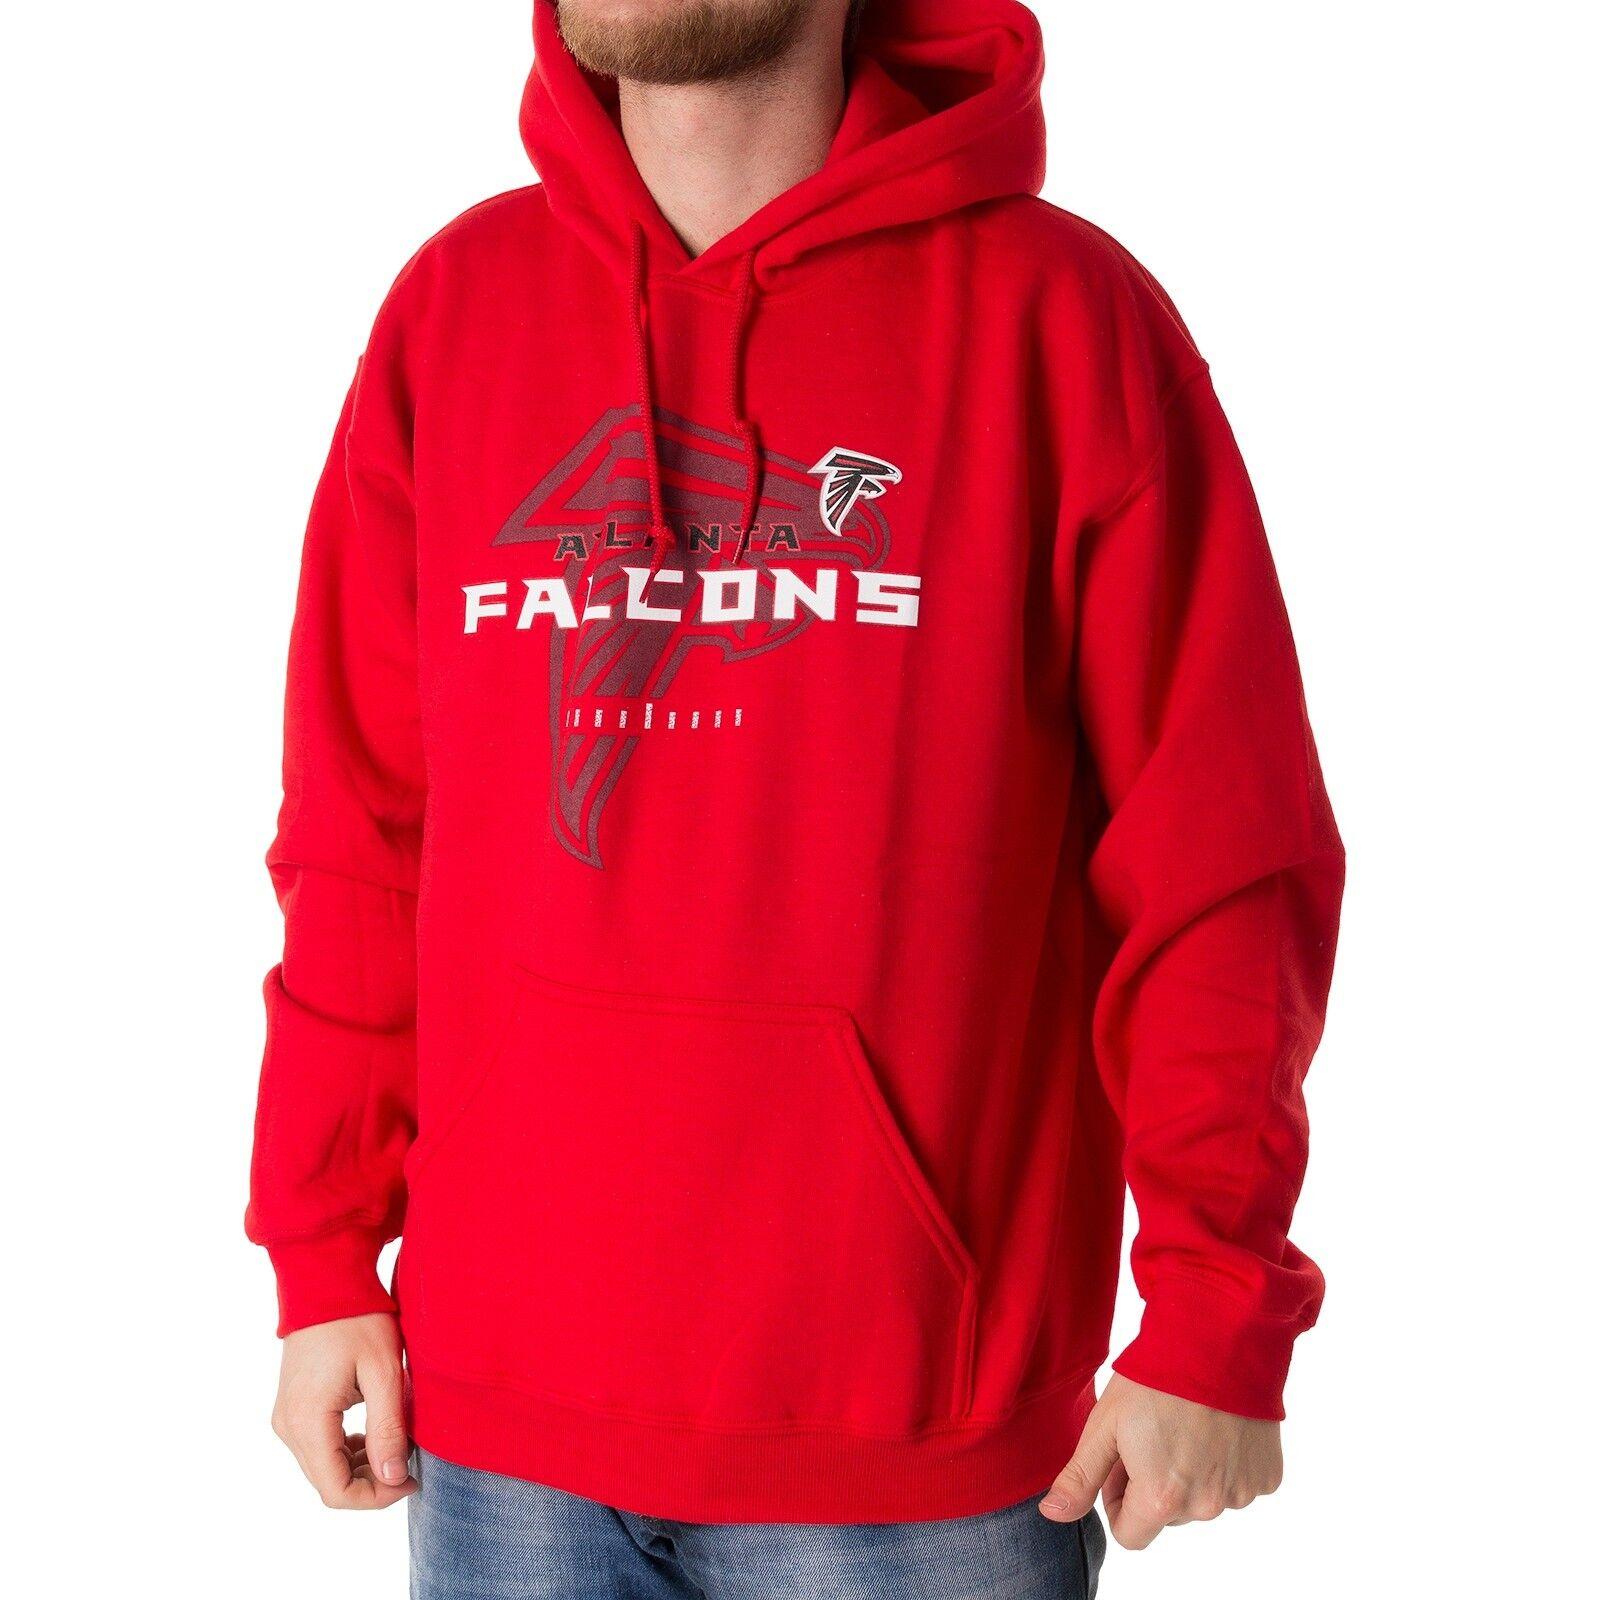 Majestic Majestic Majestic NFL Atlanta Falcons Hoodie Herren Kapuzenpullover rot 33884 0b7294